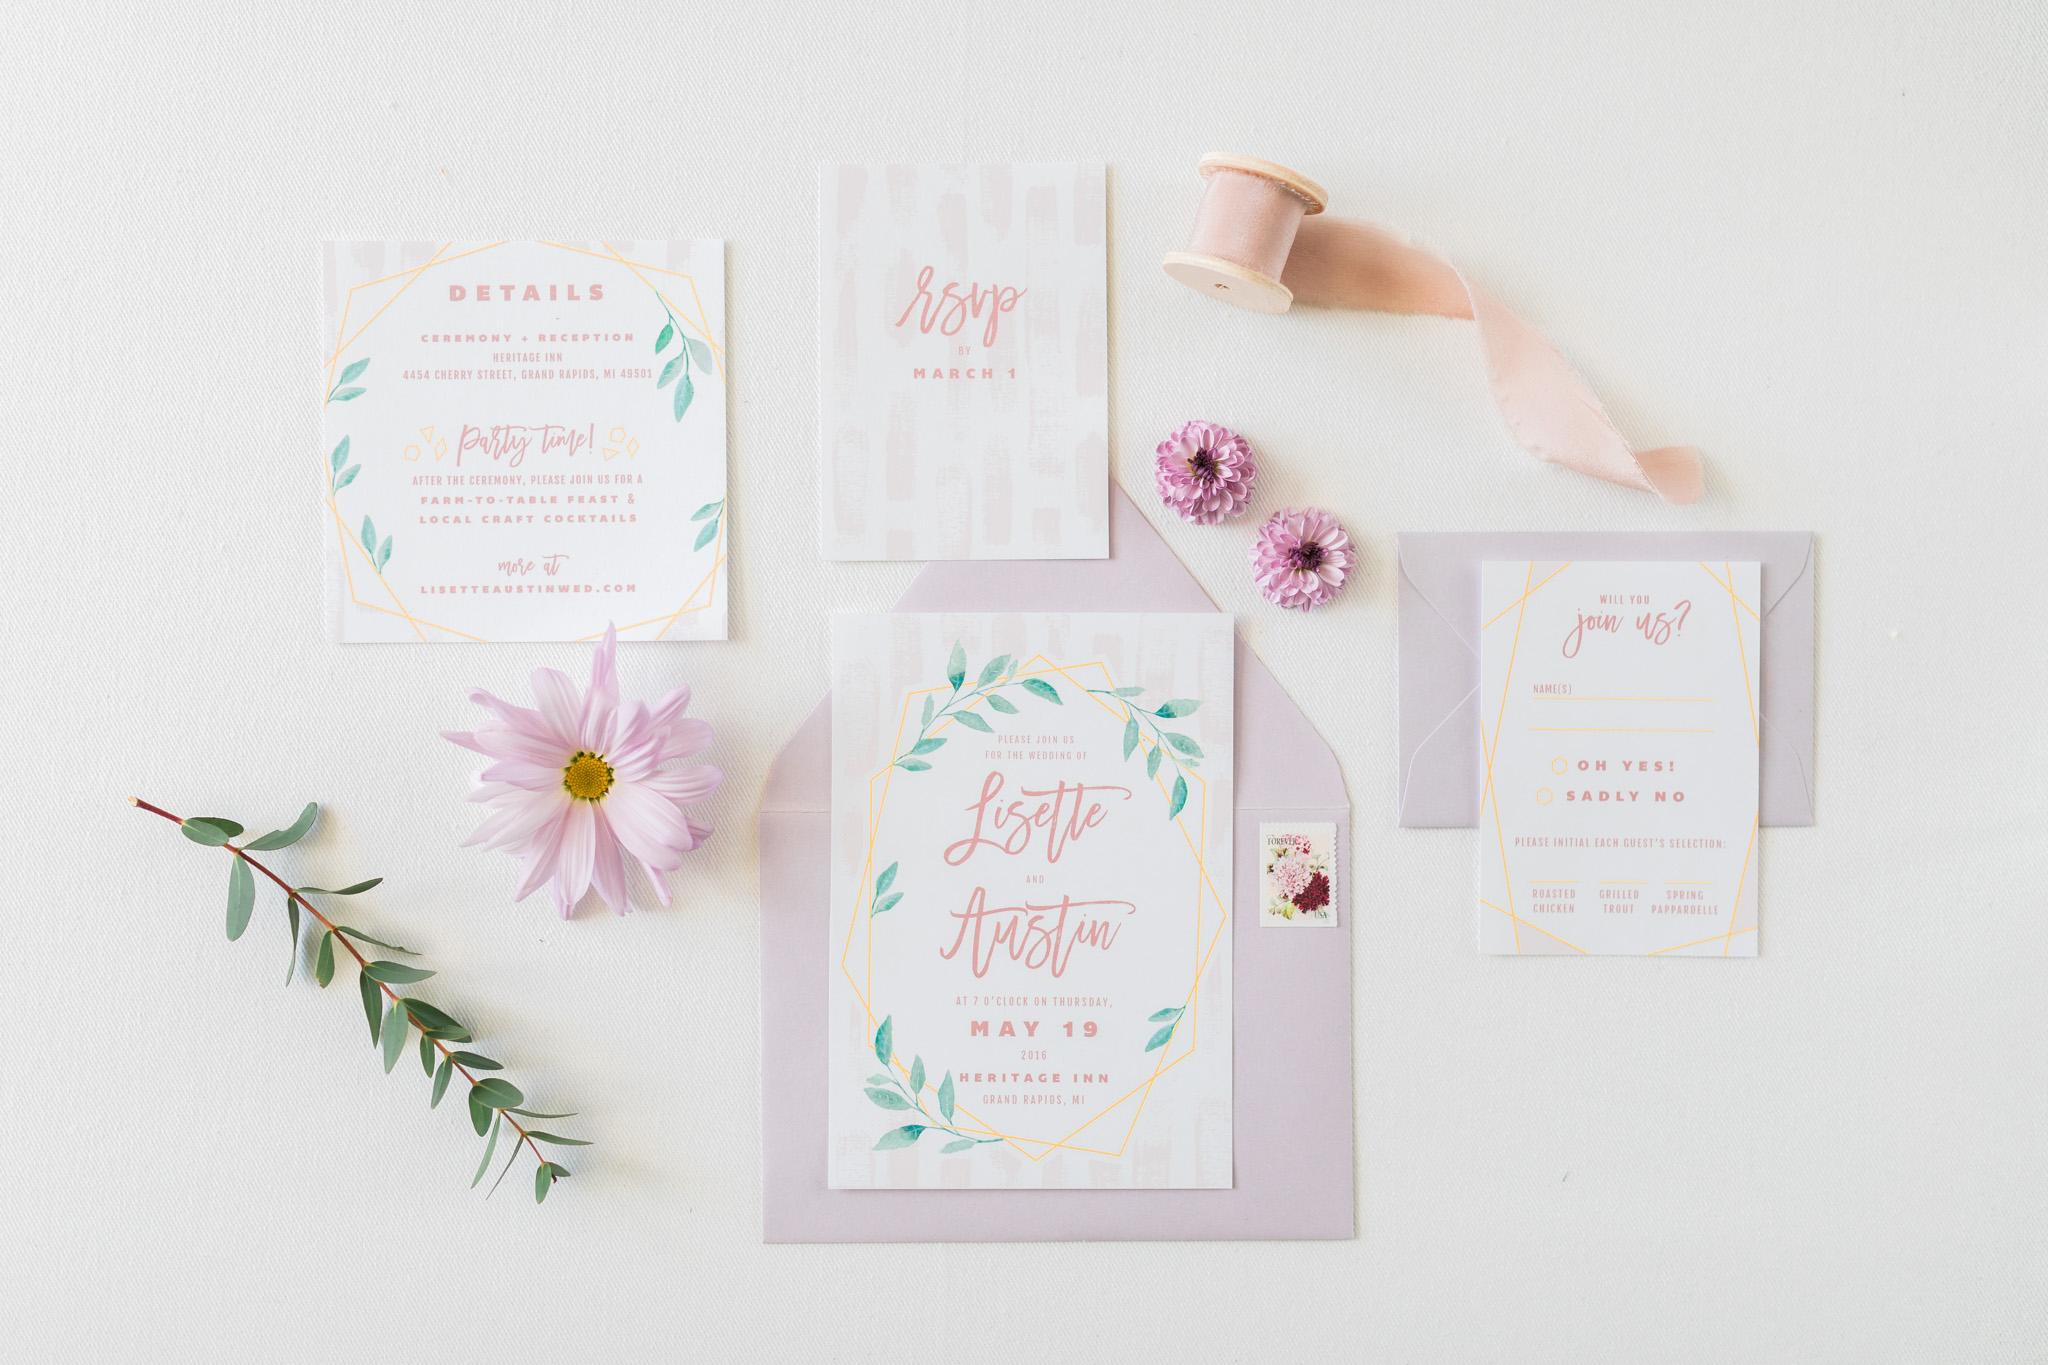 Styled Bridal Shoot | Invitation Suite | Flatlay Photography | West Michigan Wedding Photographer